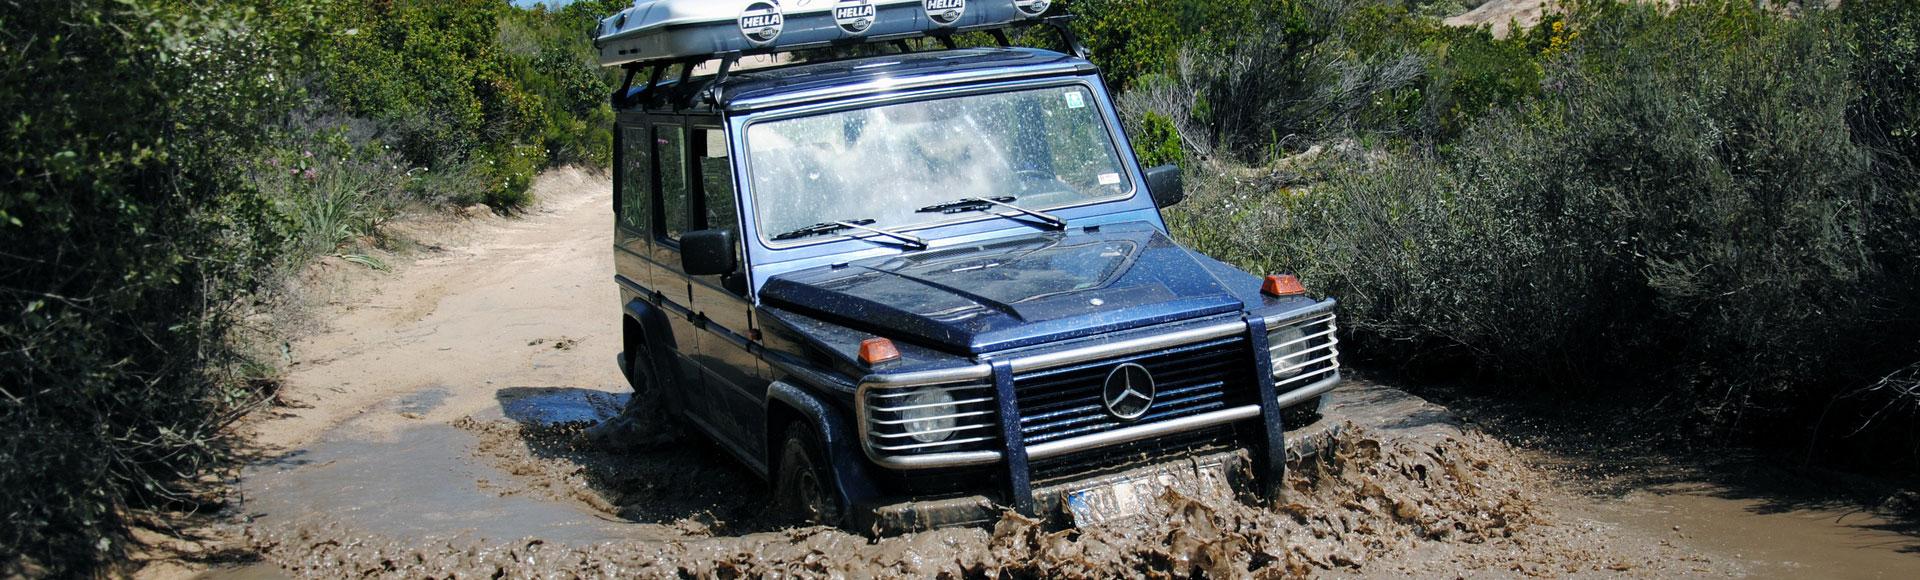 Mercedes Benz G 350 1995 Sommer 3135 2